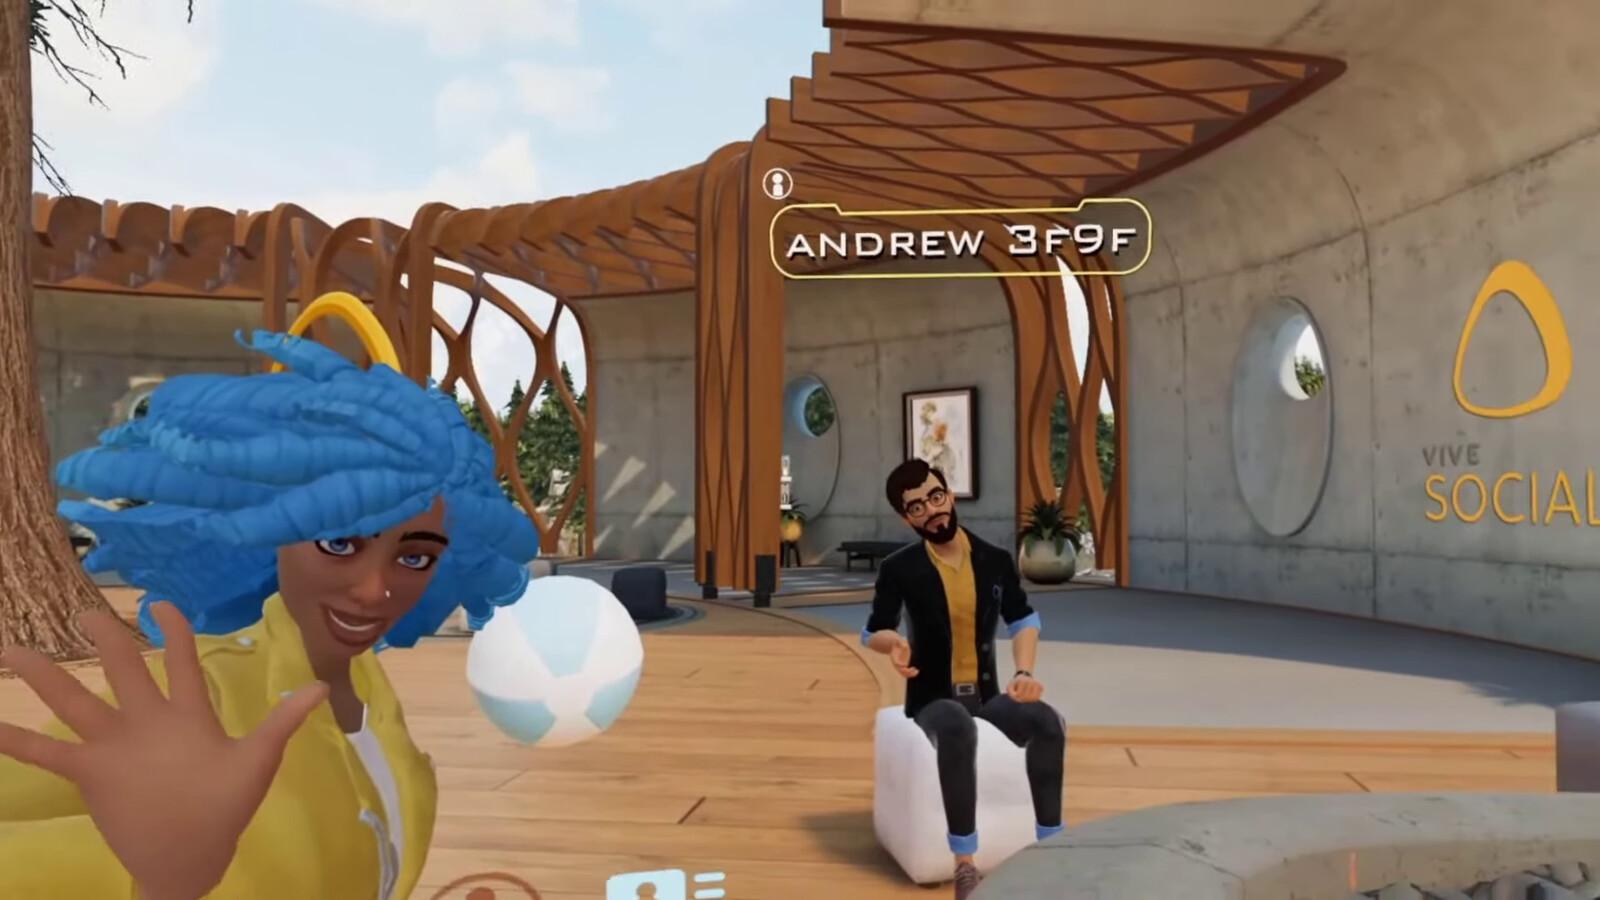 HTC XR Suite - Social VR App Integration